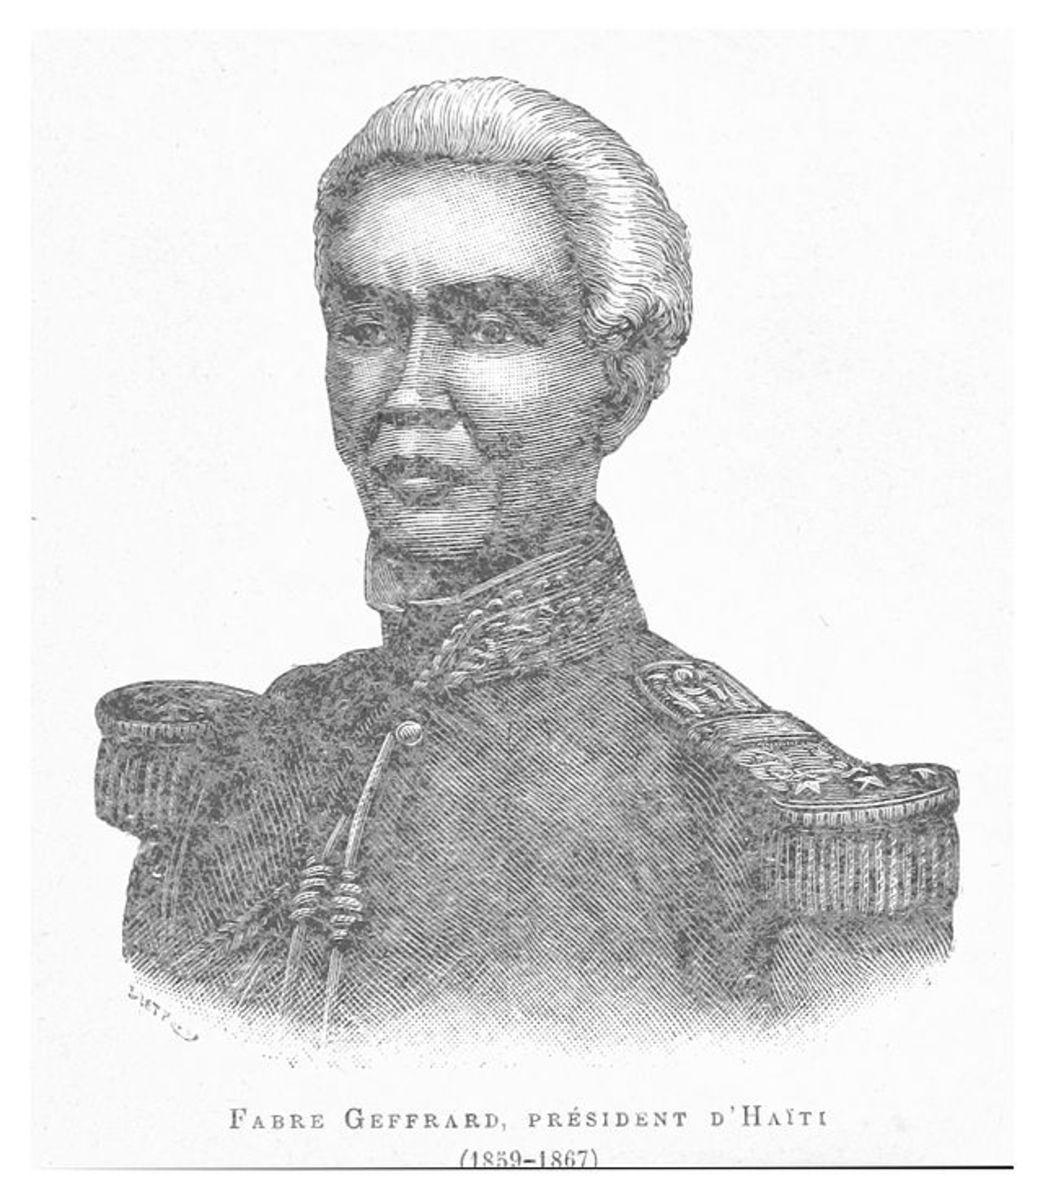 General Fabre Geffrard, President of Haiti 1859 - 1867